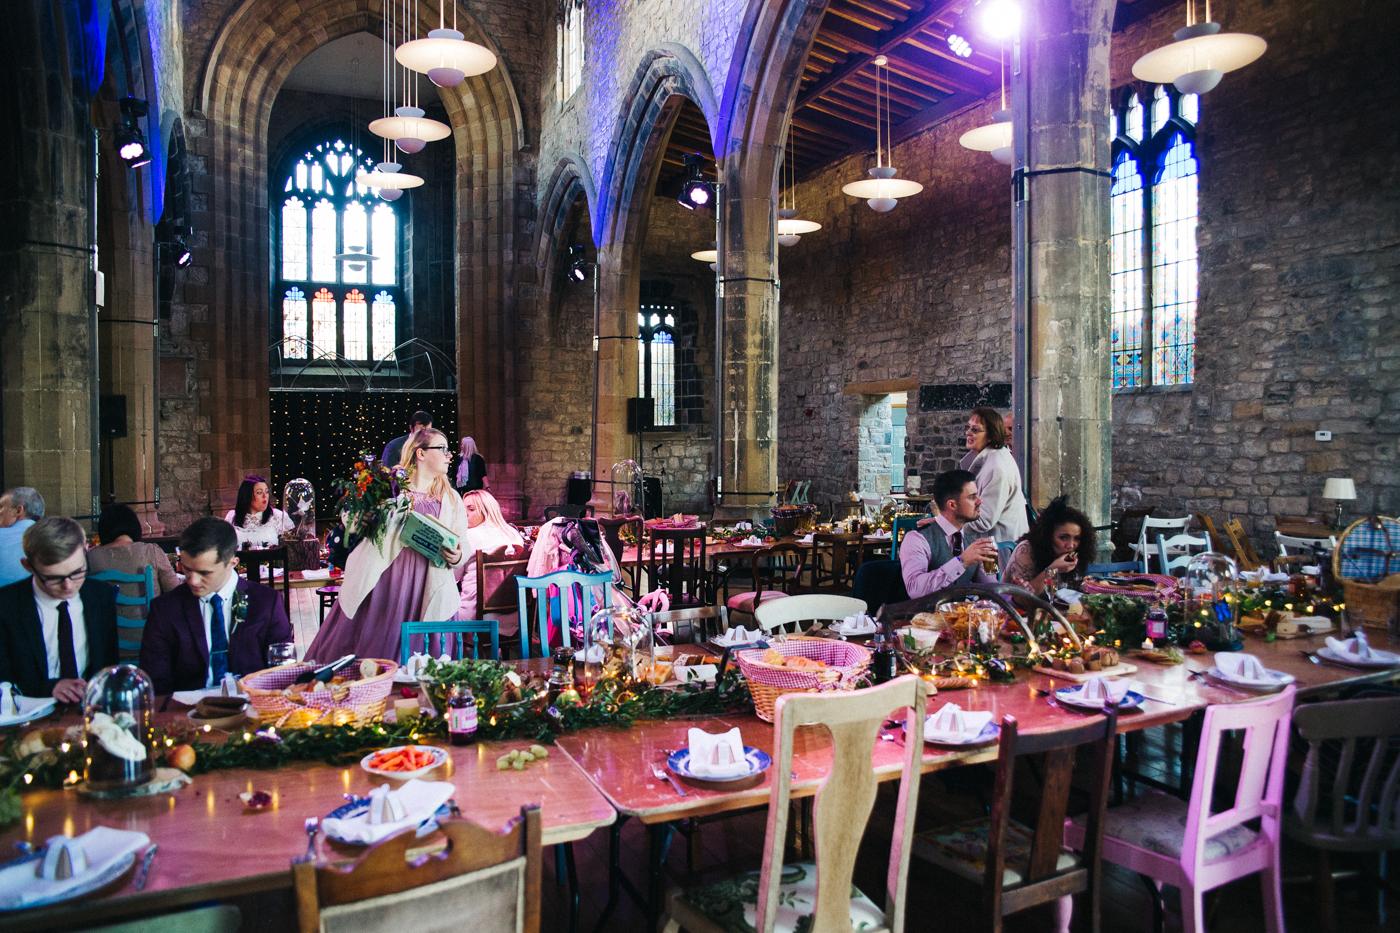 teesside-newcastle-gateshead-wedding-photography-photographer-creative-0054.jpg